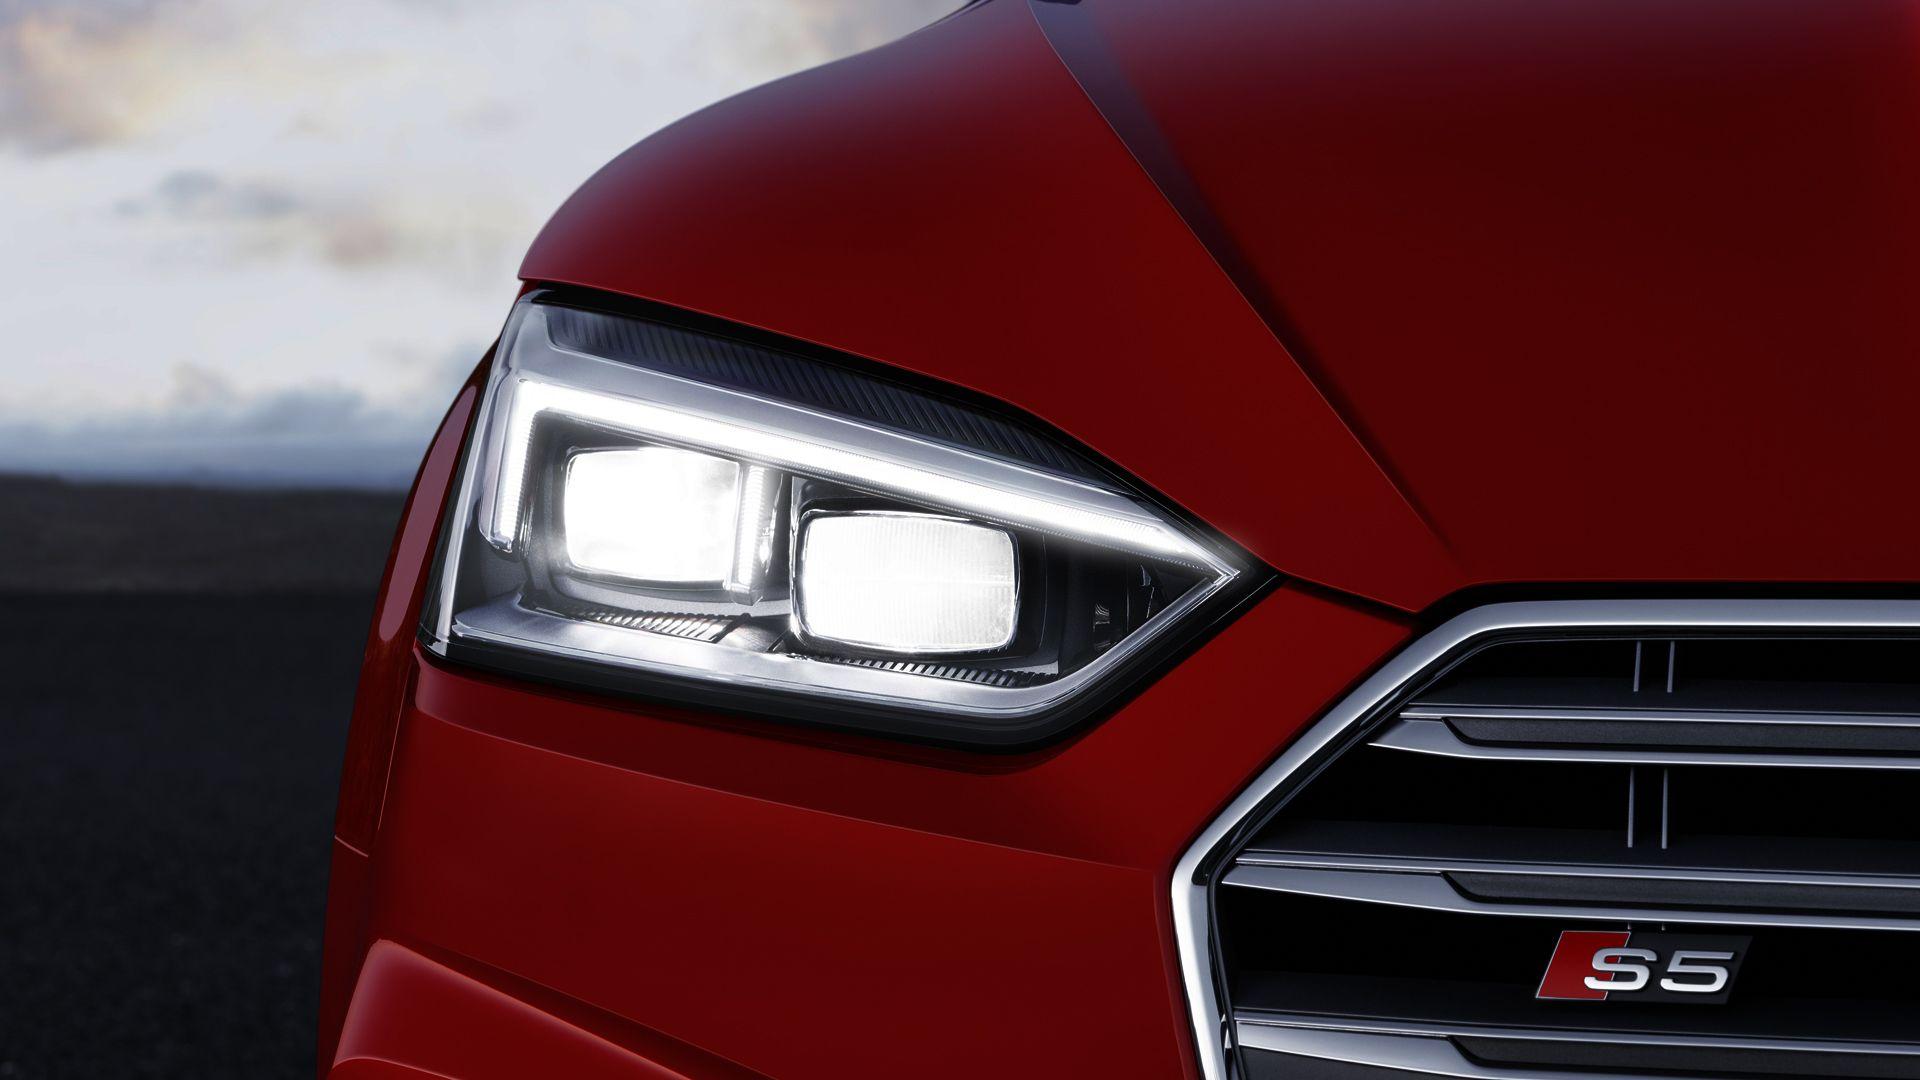 Audi A5 2016 Headlights Audi Autos Led